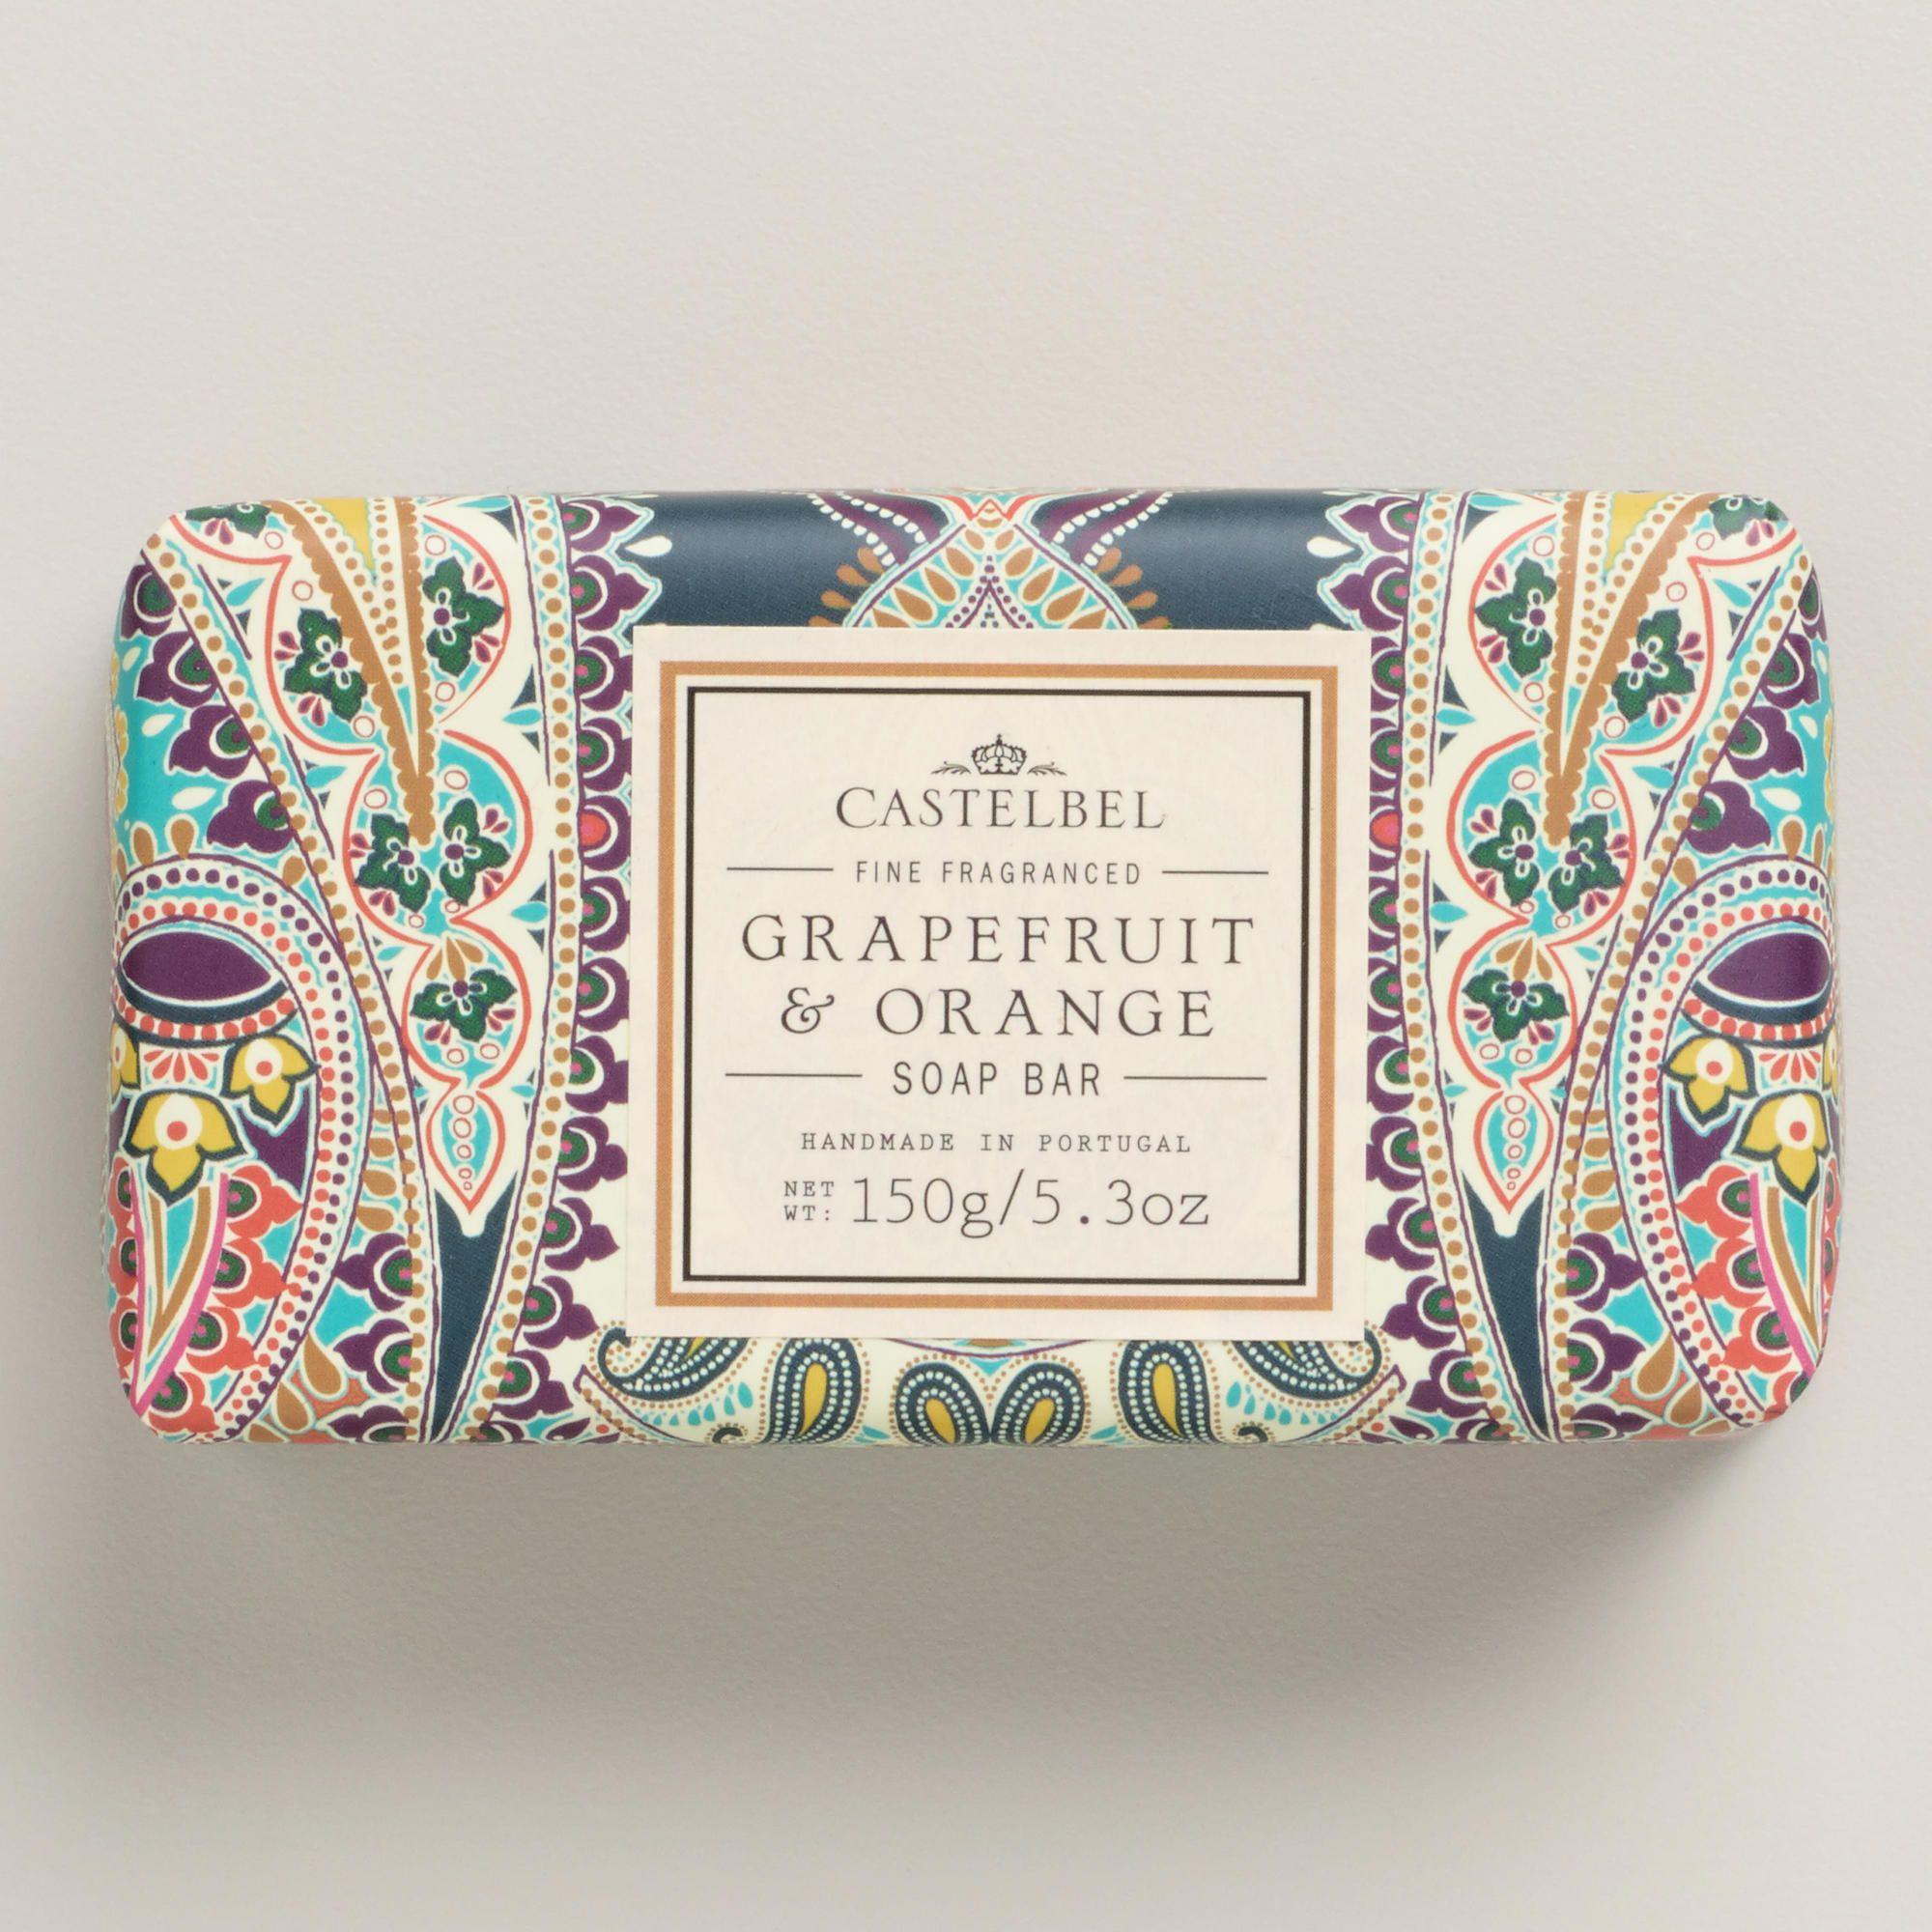 Castelbel Grapefruit & Orange Bar Soap | World Market #Design #Portugal #Castelbel